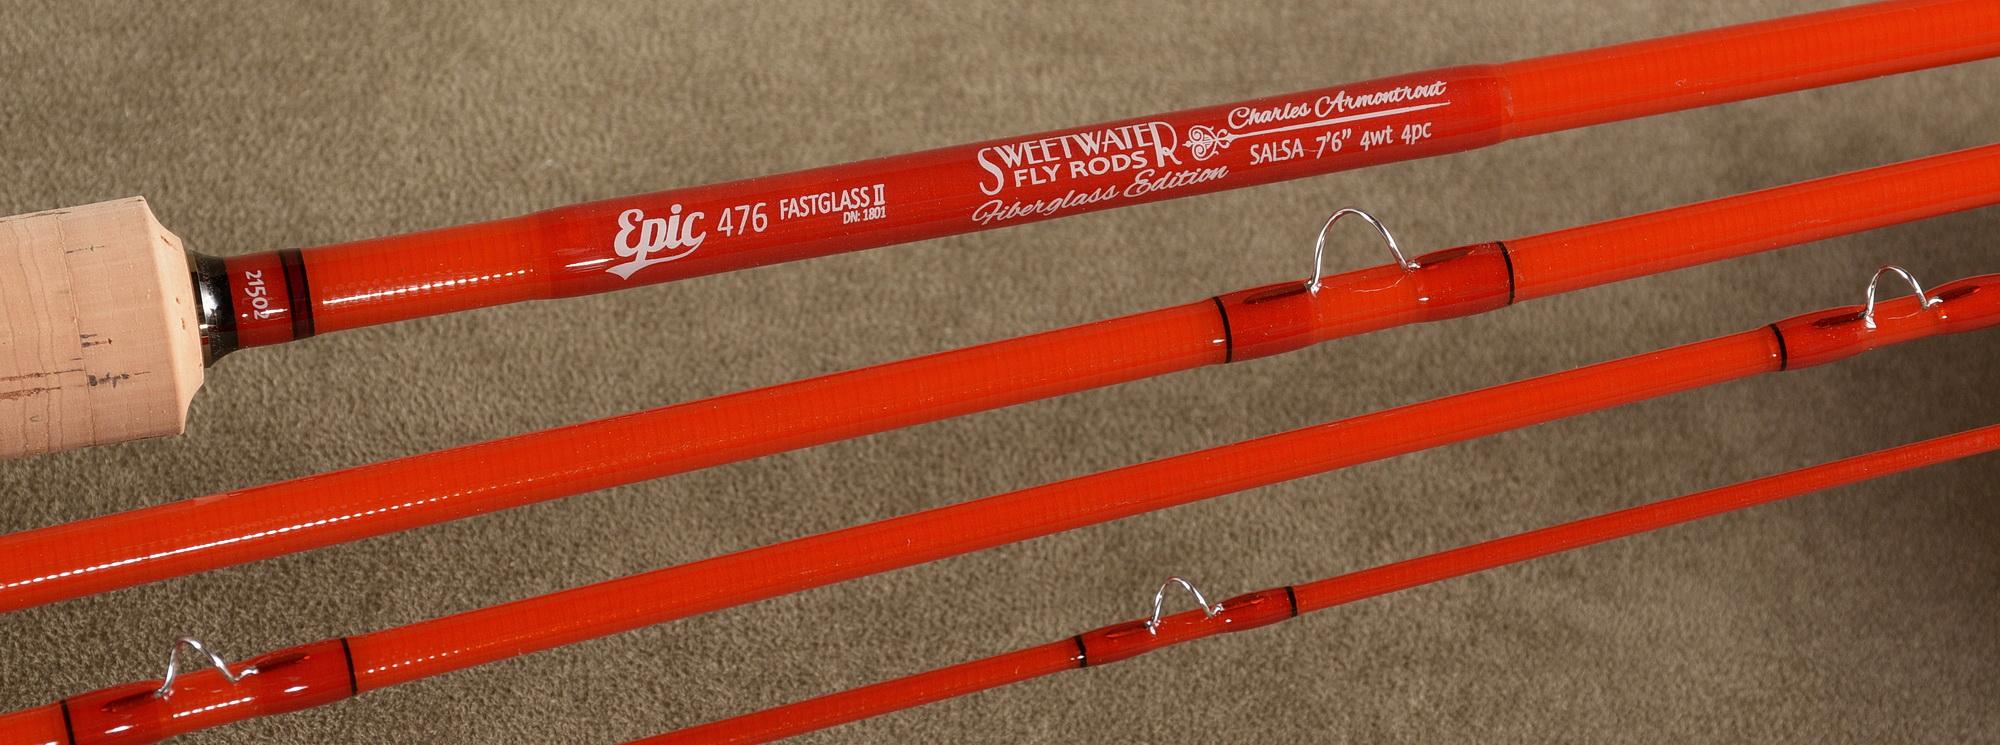 EPIC 476 SALSA--21502